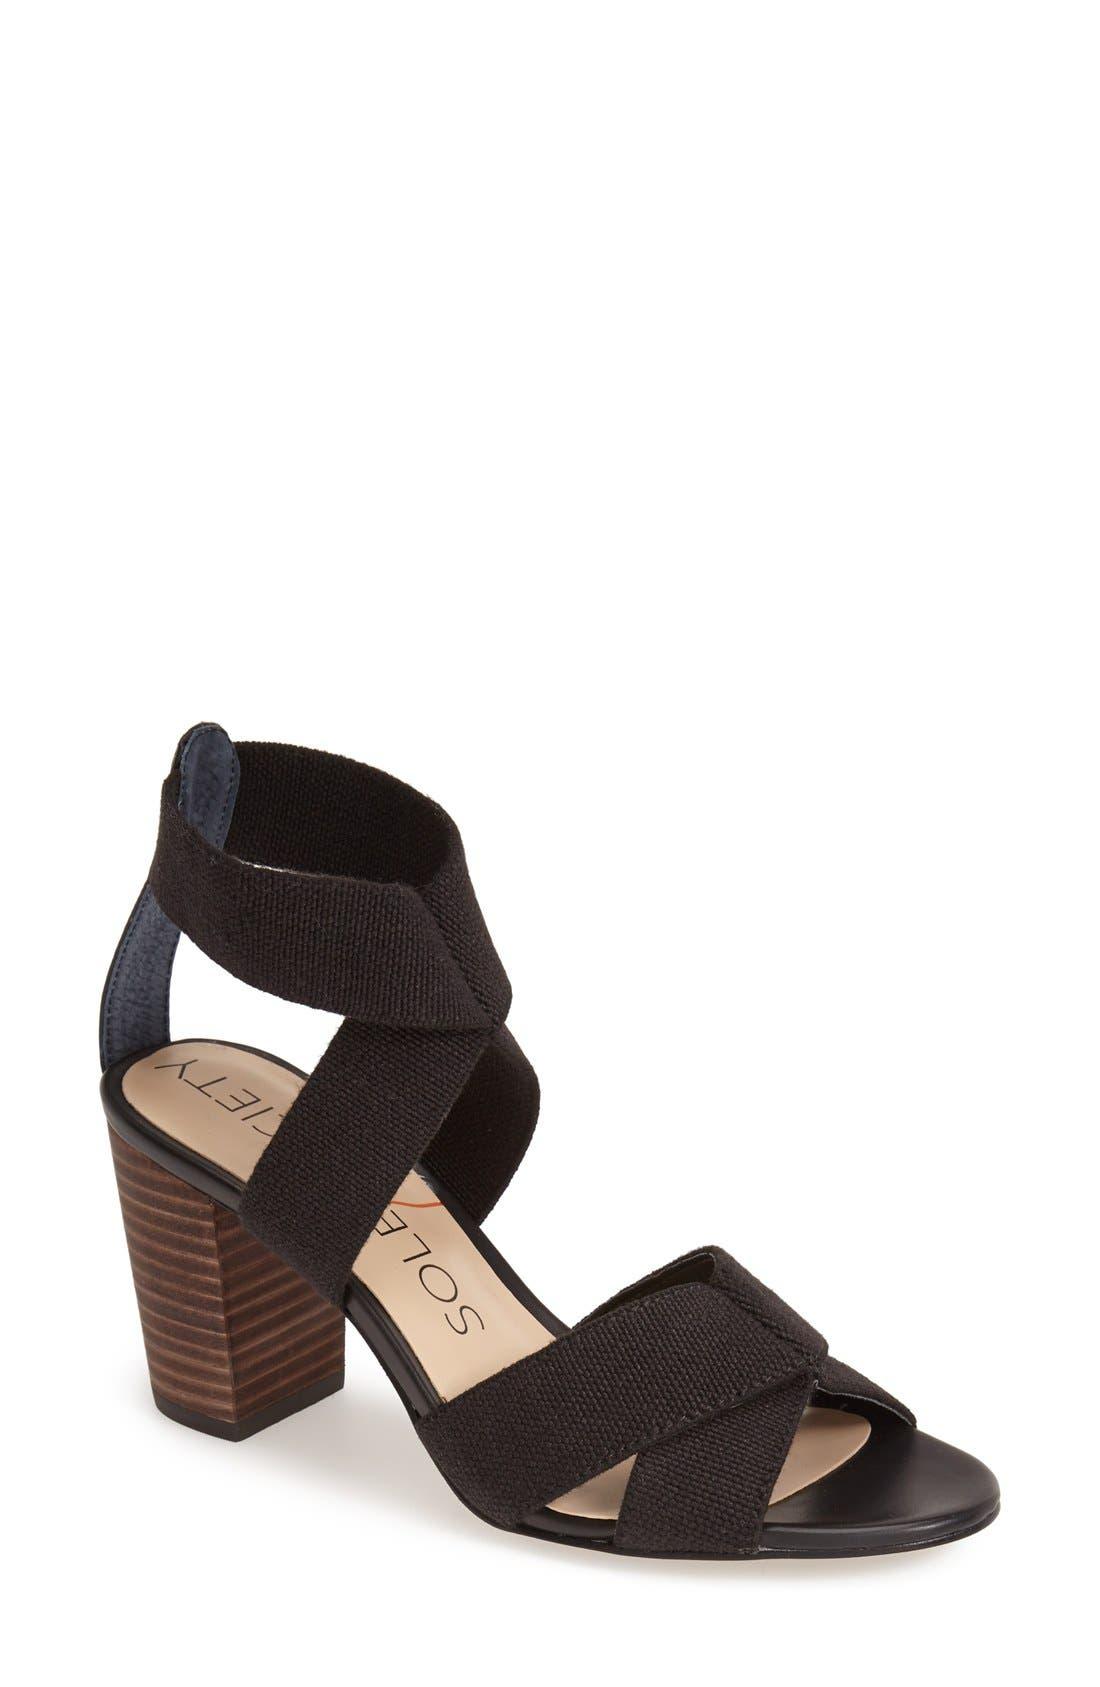 'Joesy' Block Heel Sandal, Main, color, 001